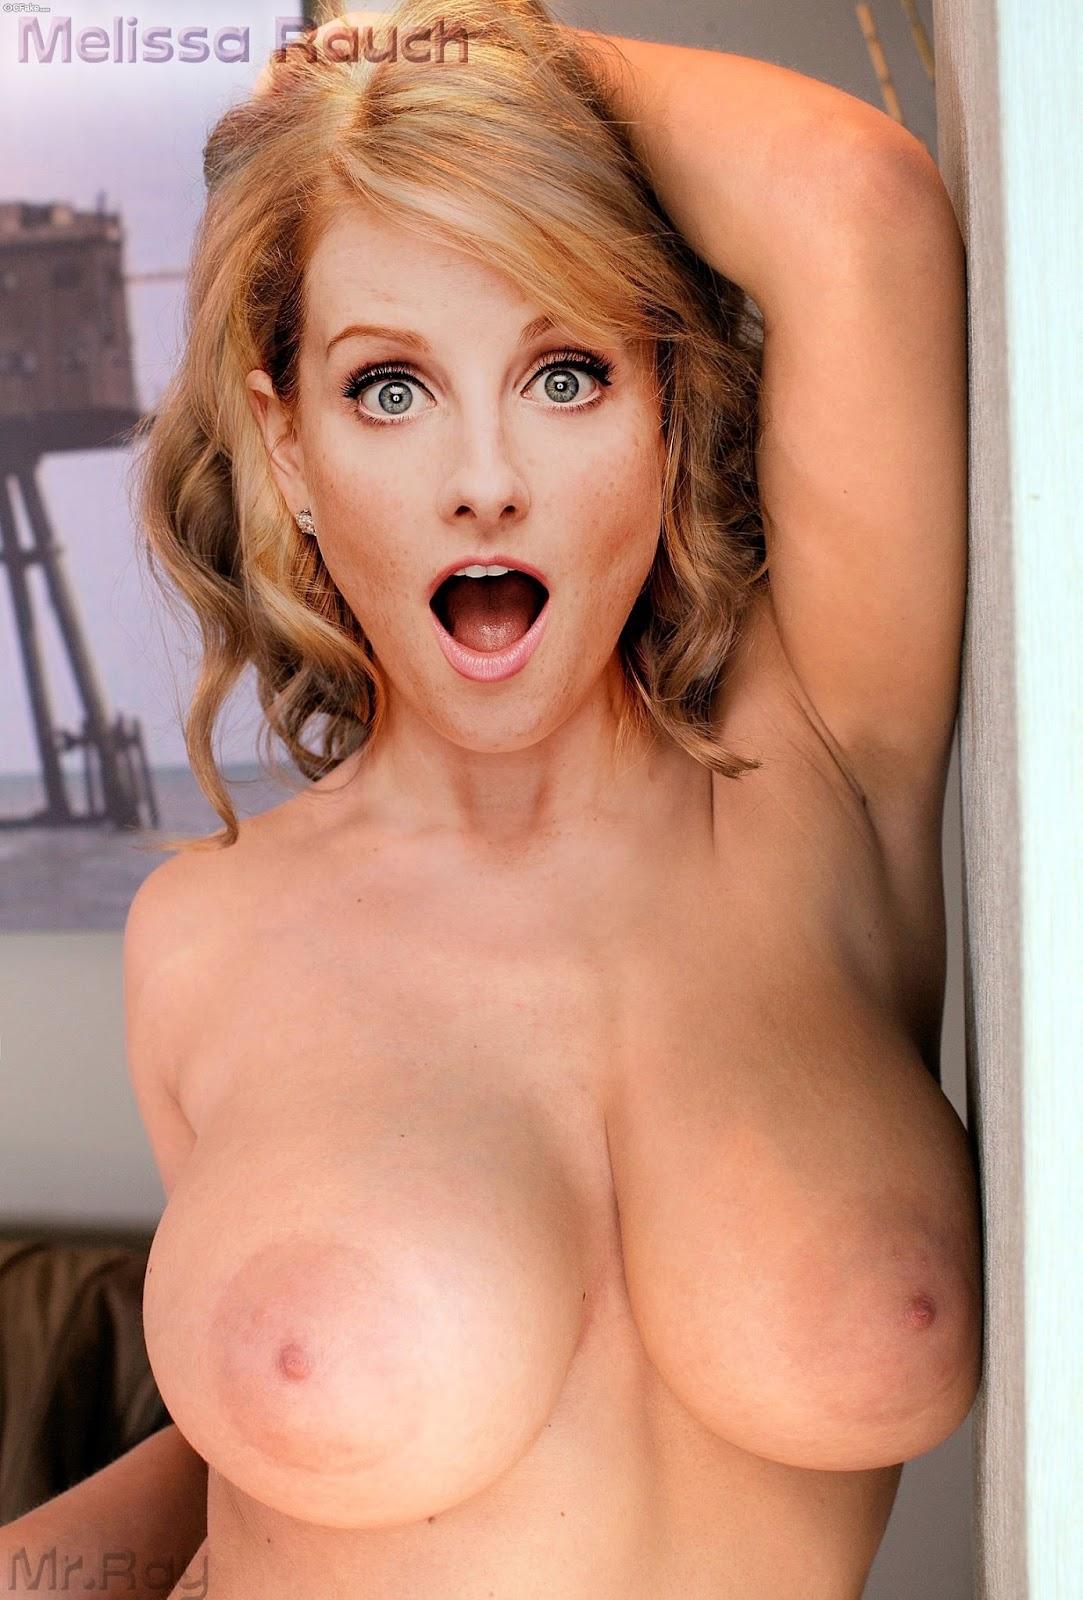 Big boobs Melissa Rauch nude tits sexy naked nipple fake porn